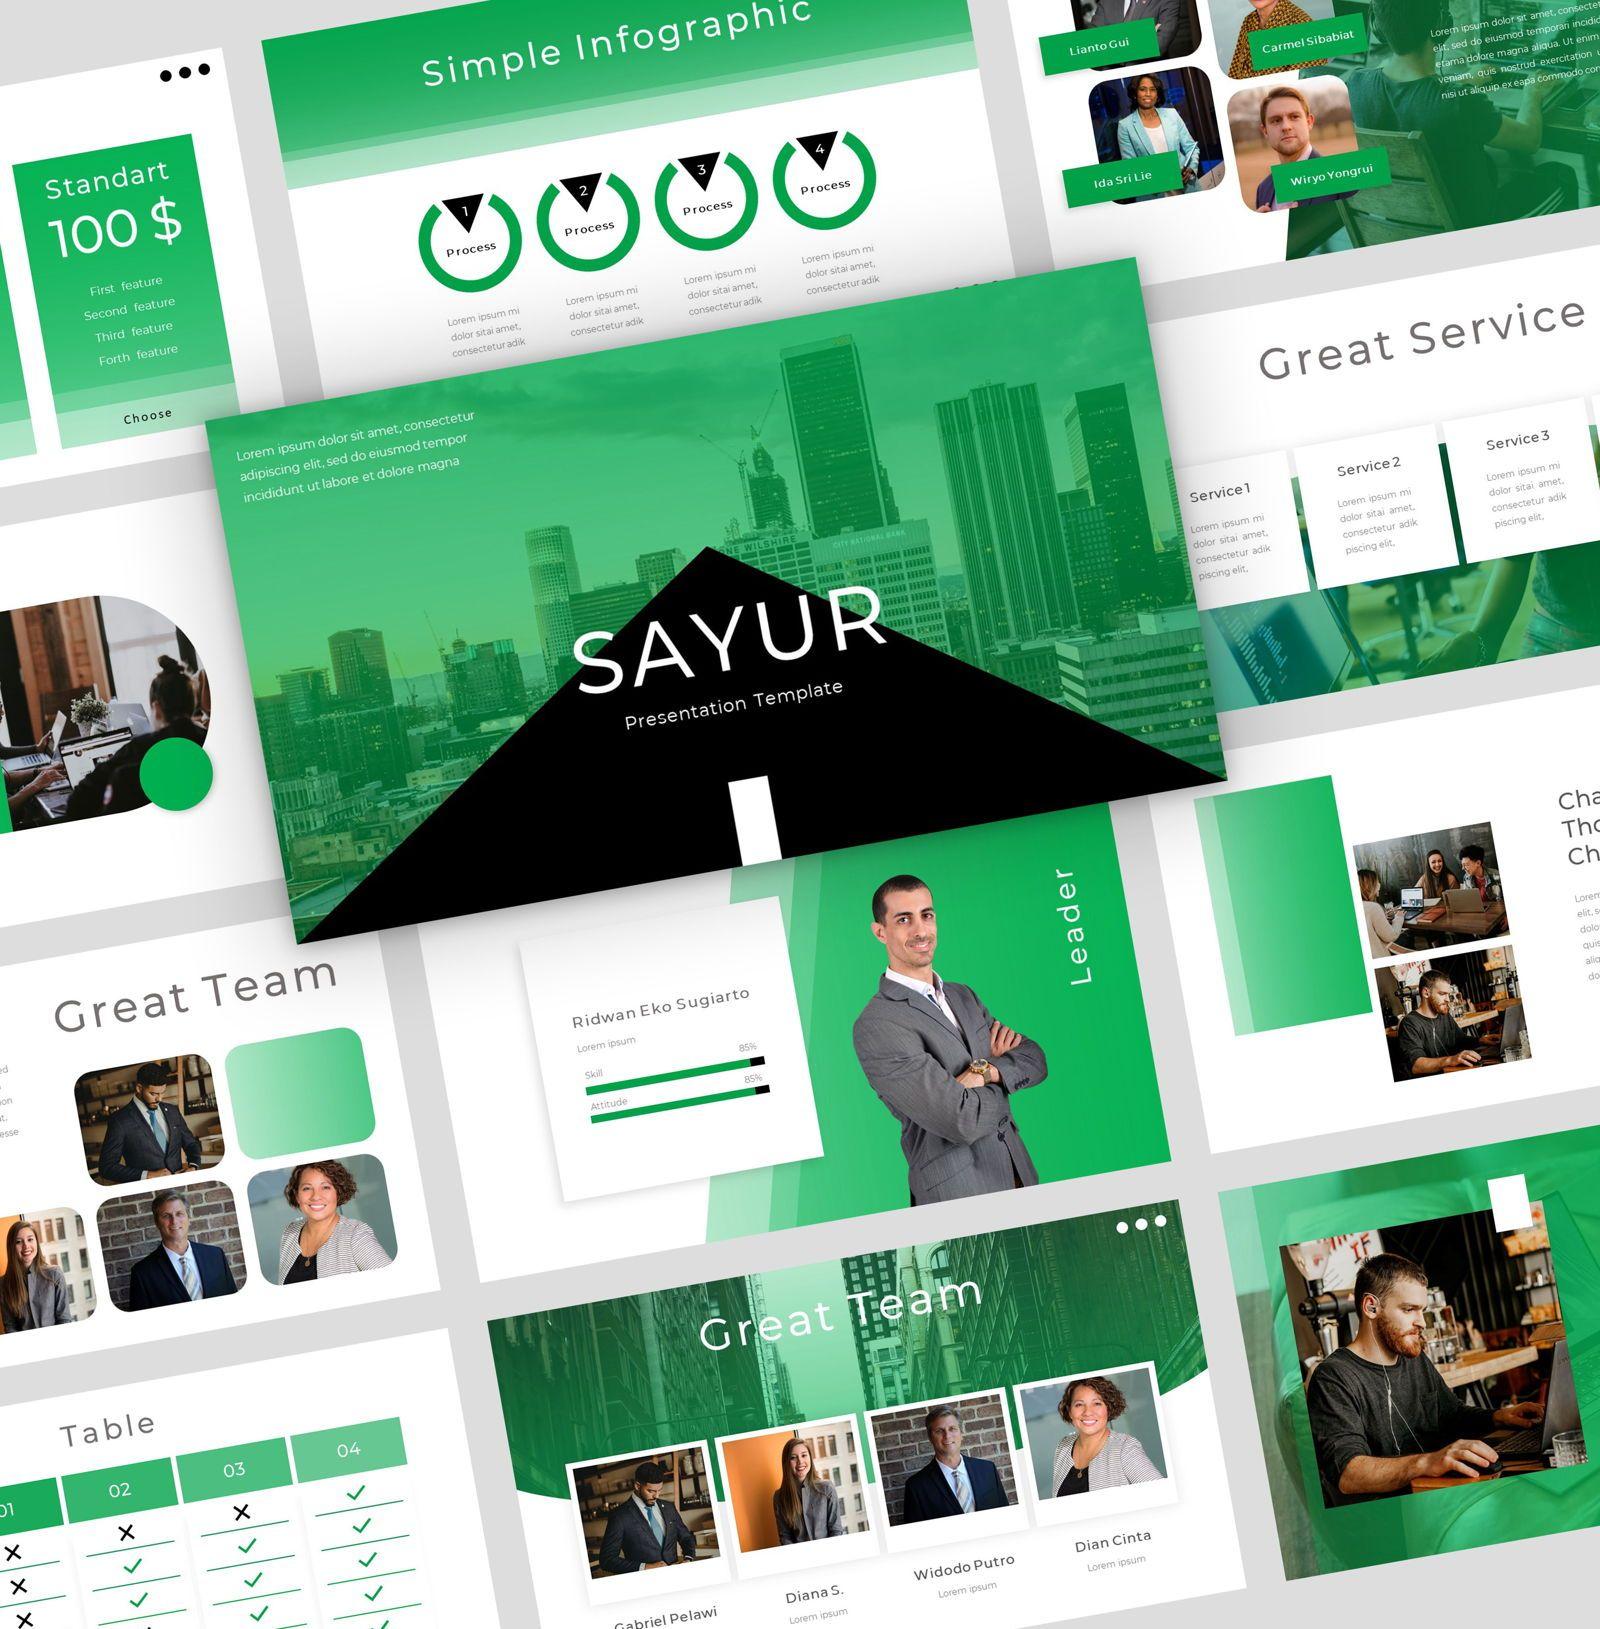 sayur - Google Slide Presentation Template, 08084, Presentation Templates — PoweredTemplate.com